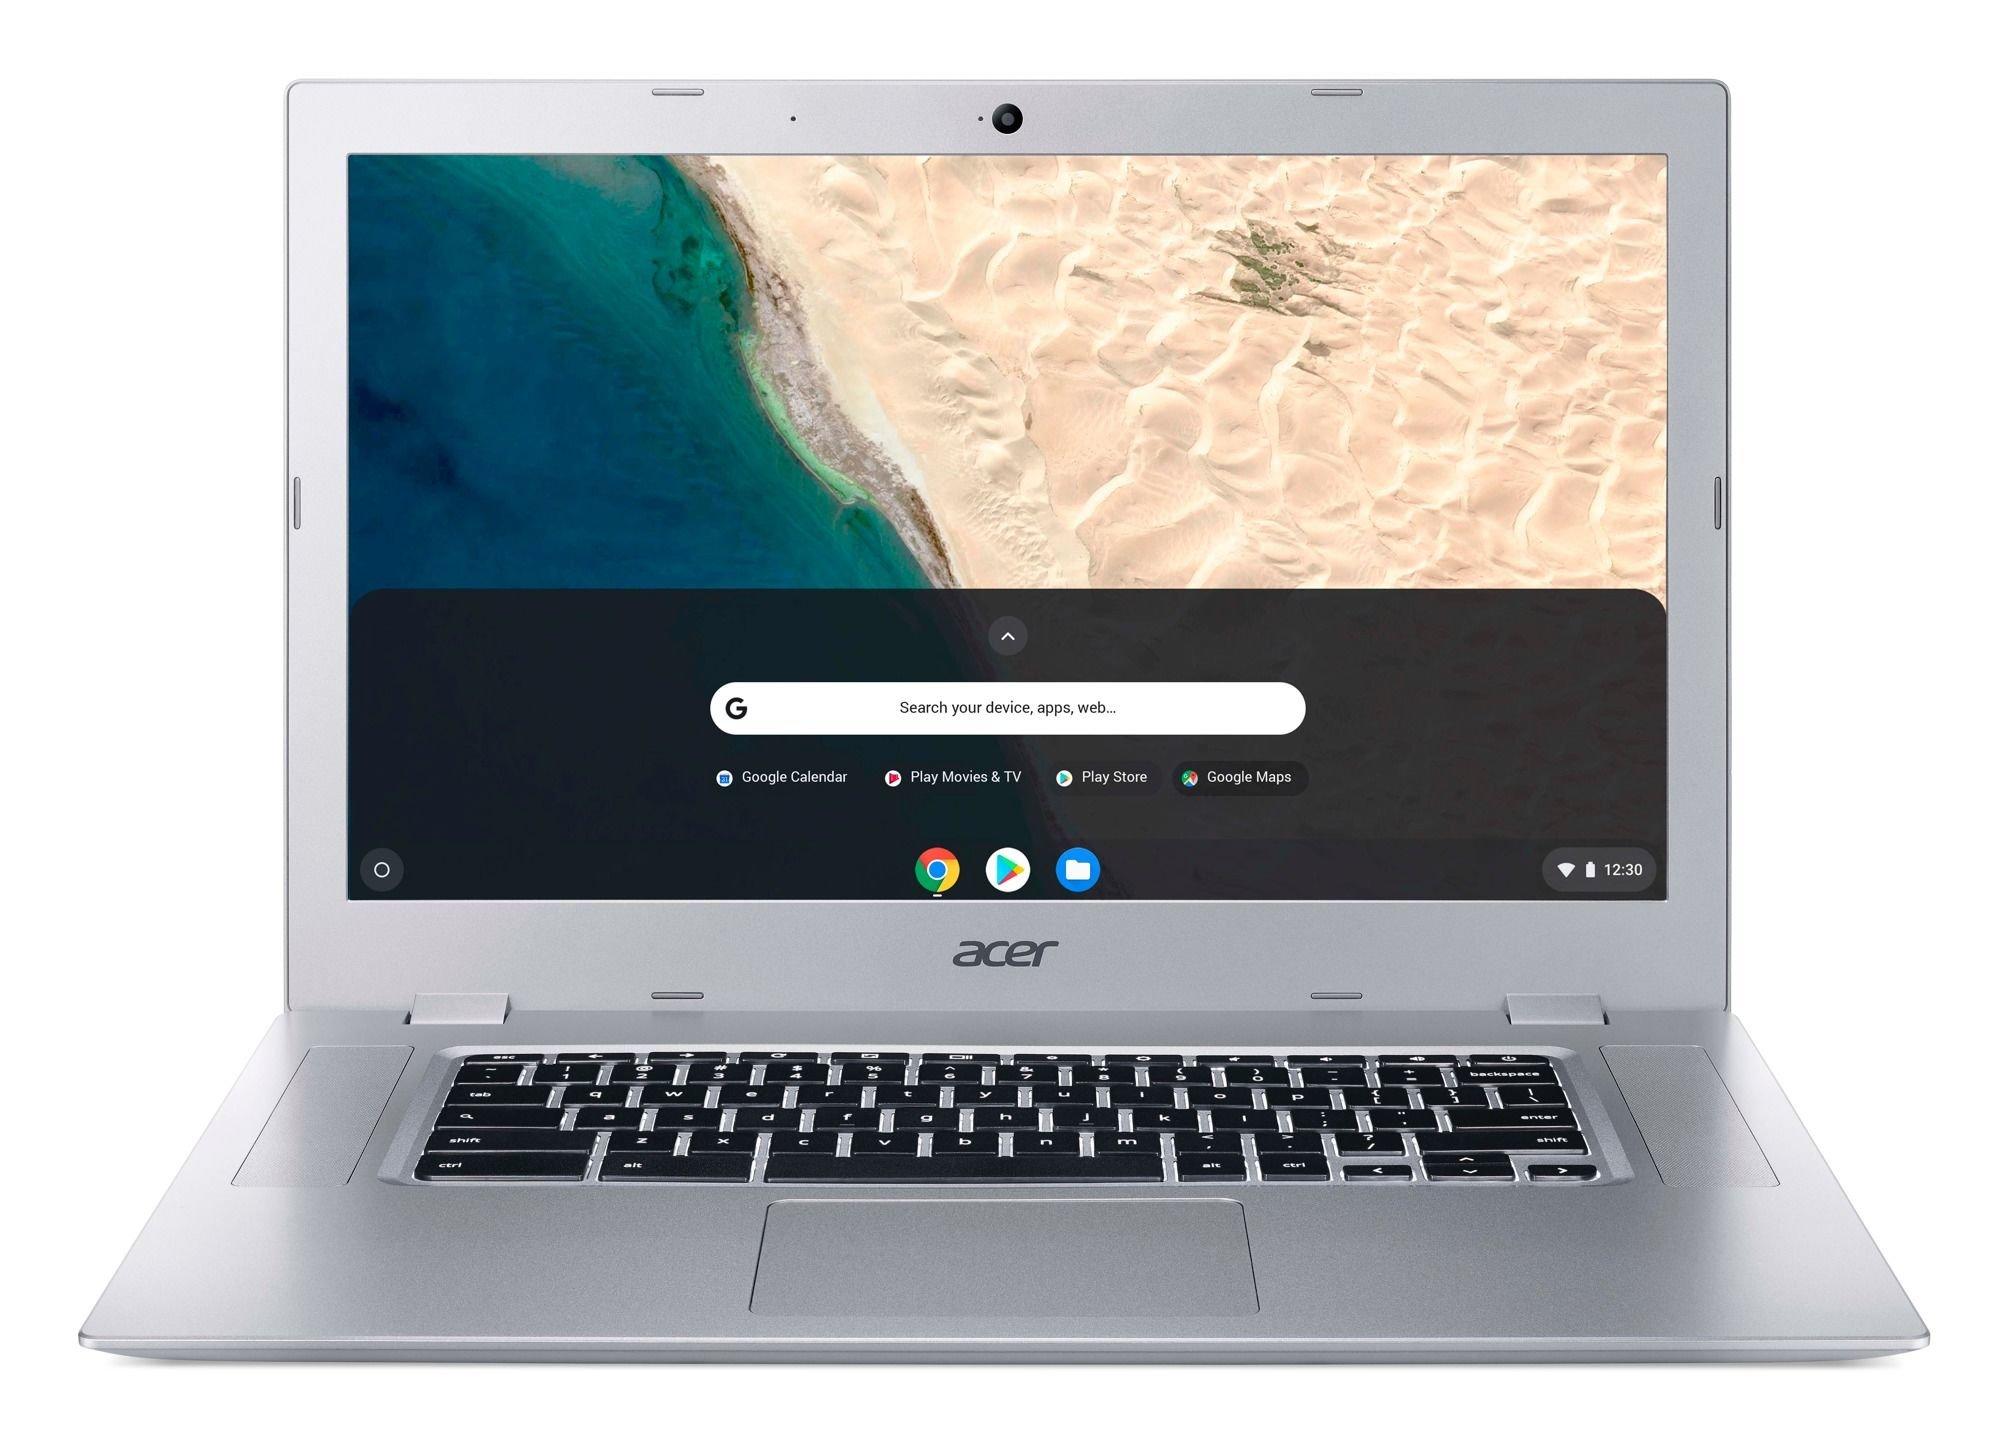 Acer Chromebook 315 15.6in Full HD screen, AMD 1.8Ghz, 4GB DDR4, 64GB SSD - £199.99 on Amazon Treasure Truck